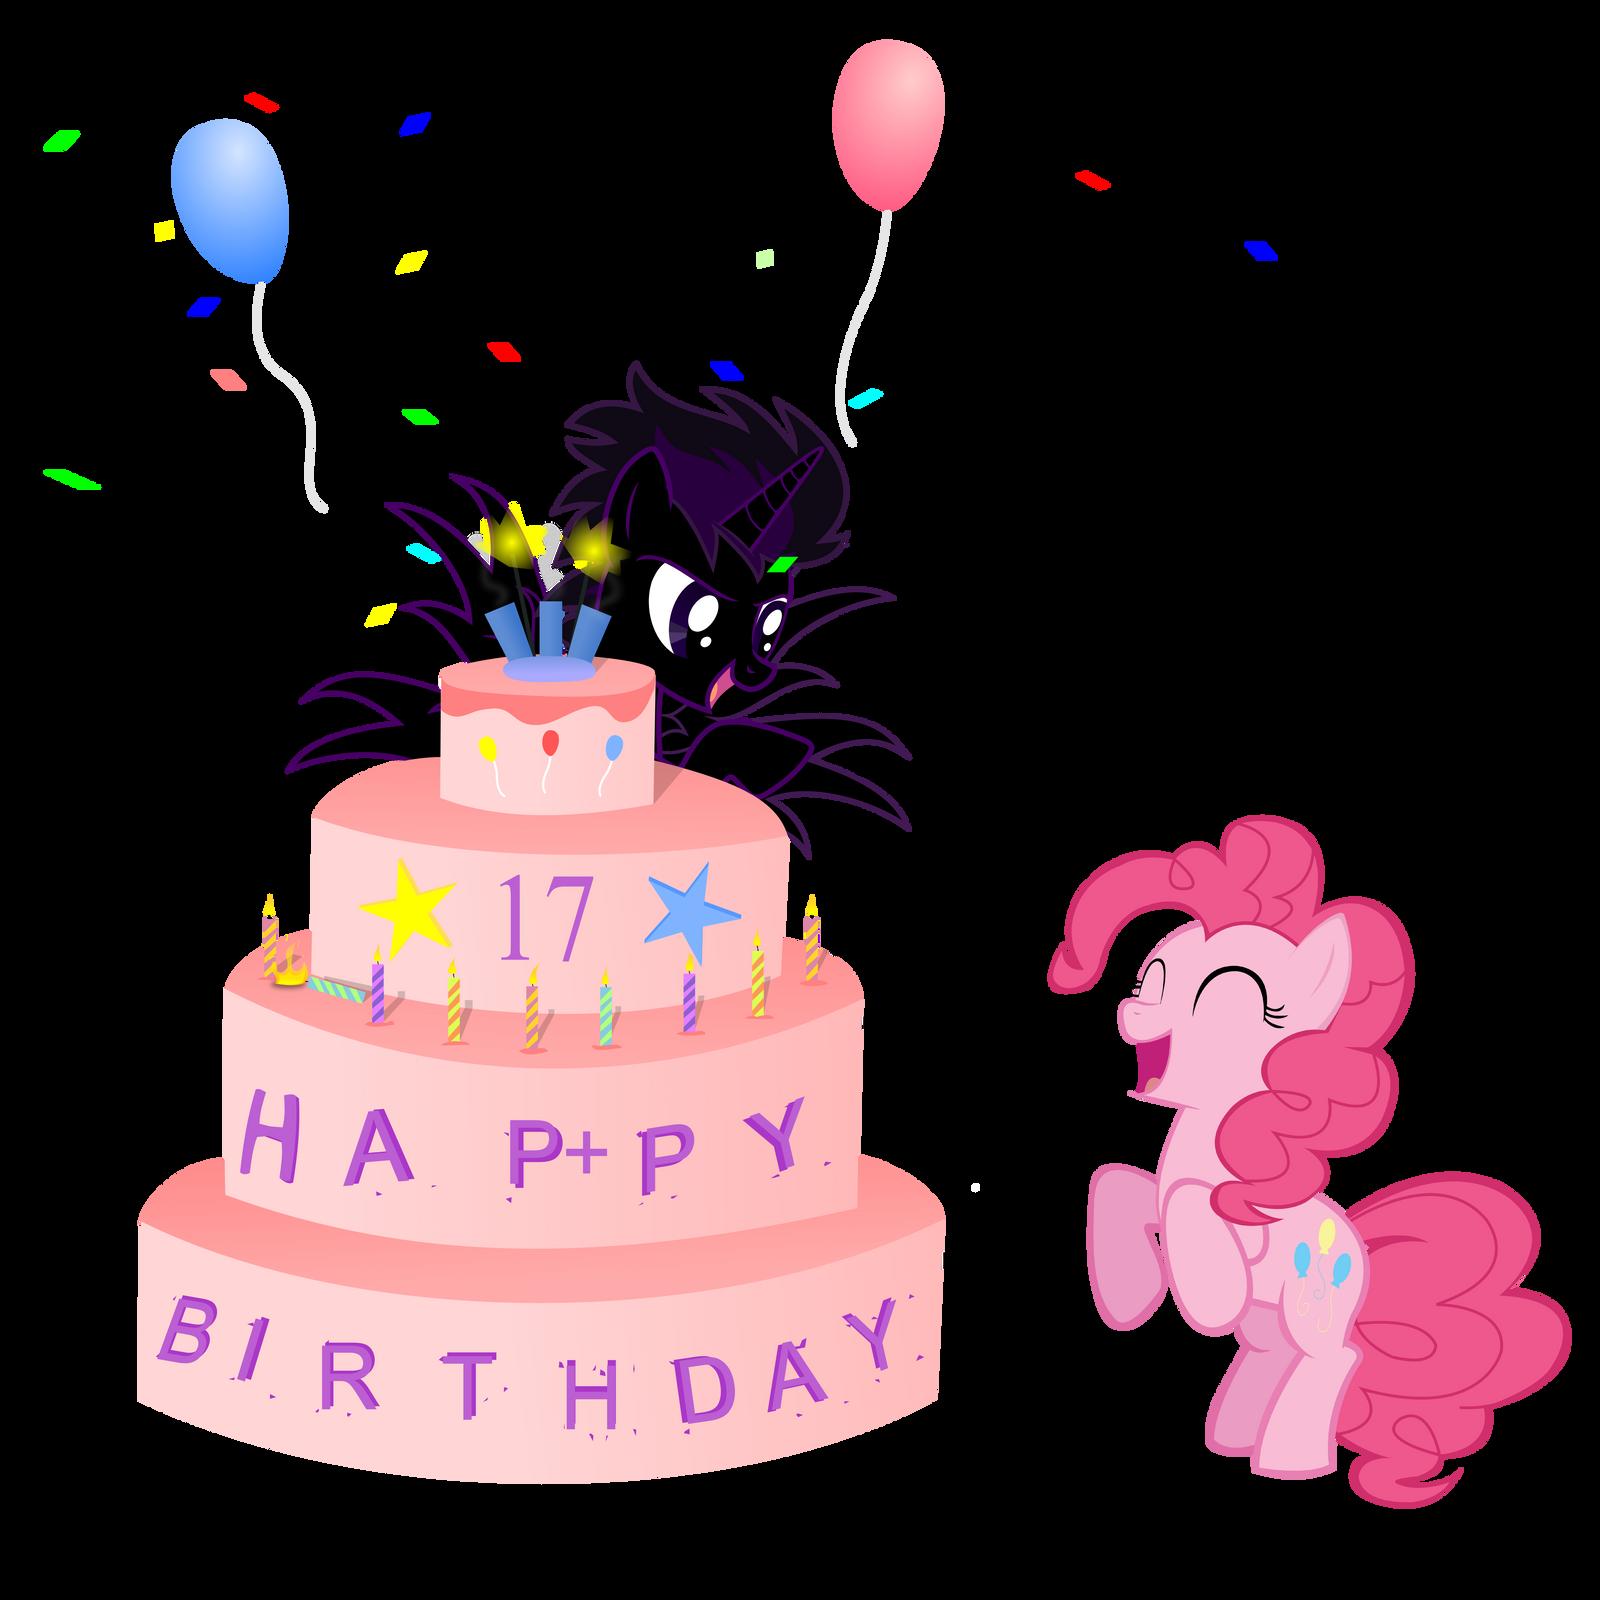 Happy 17th Birthday ments ma